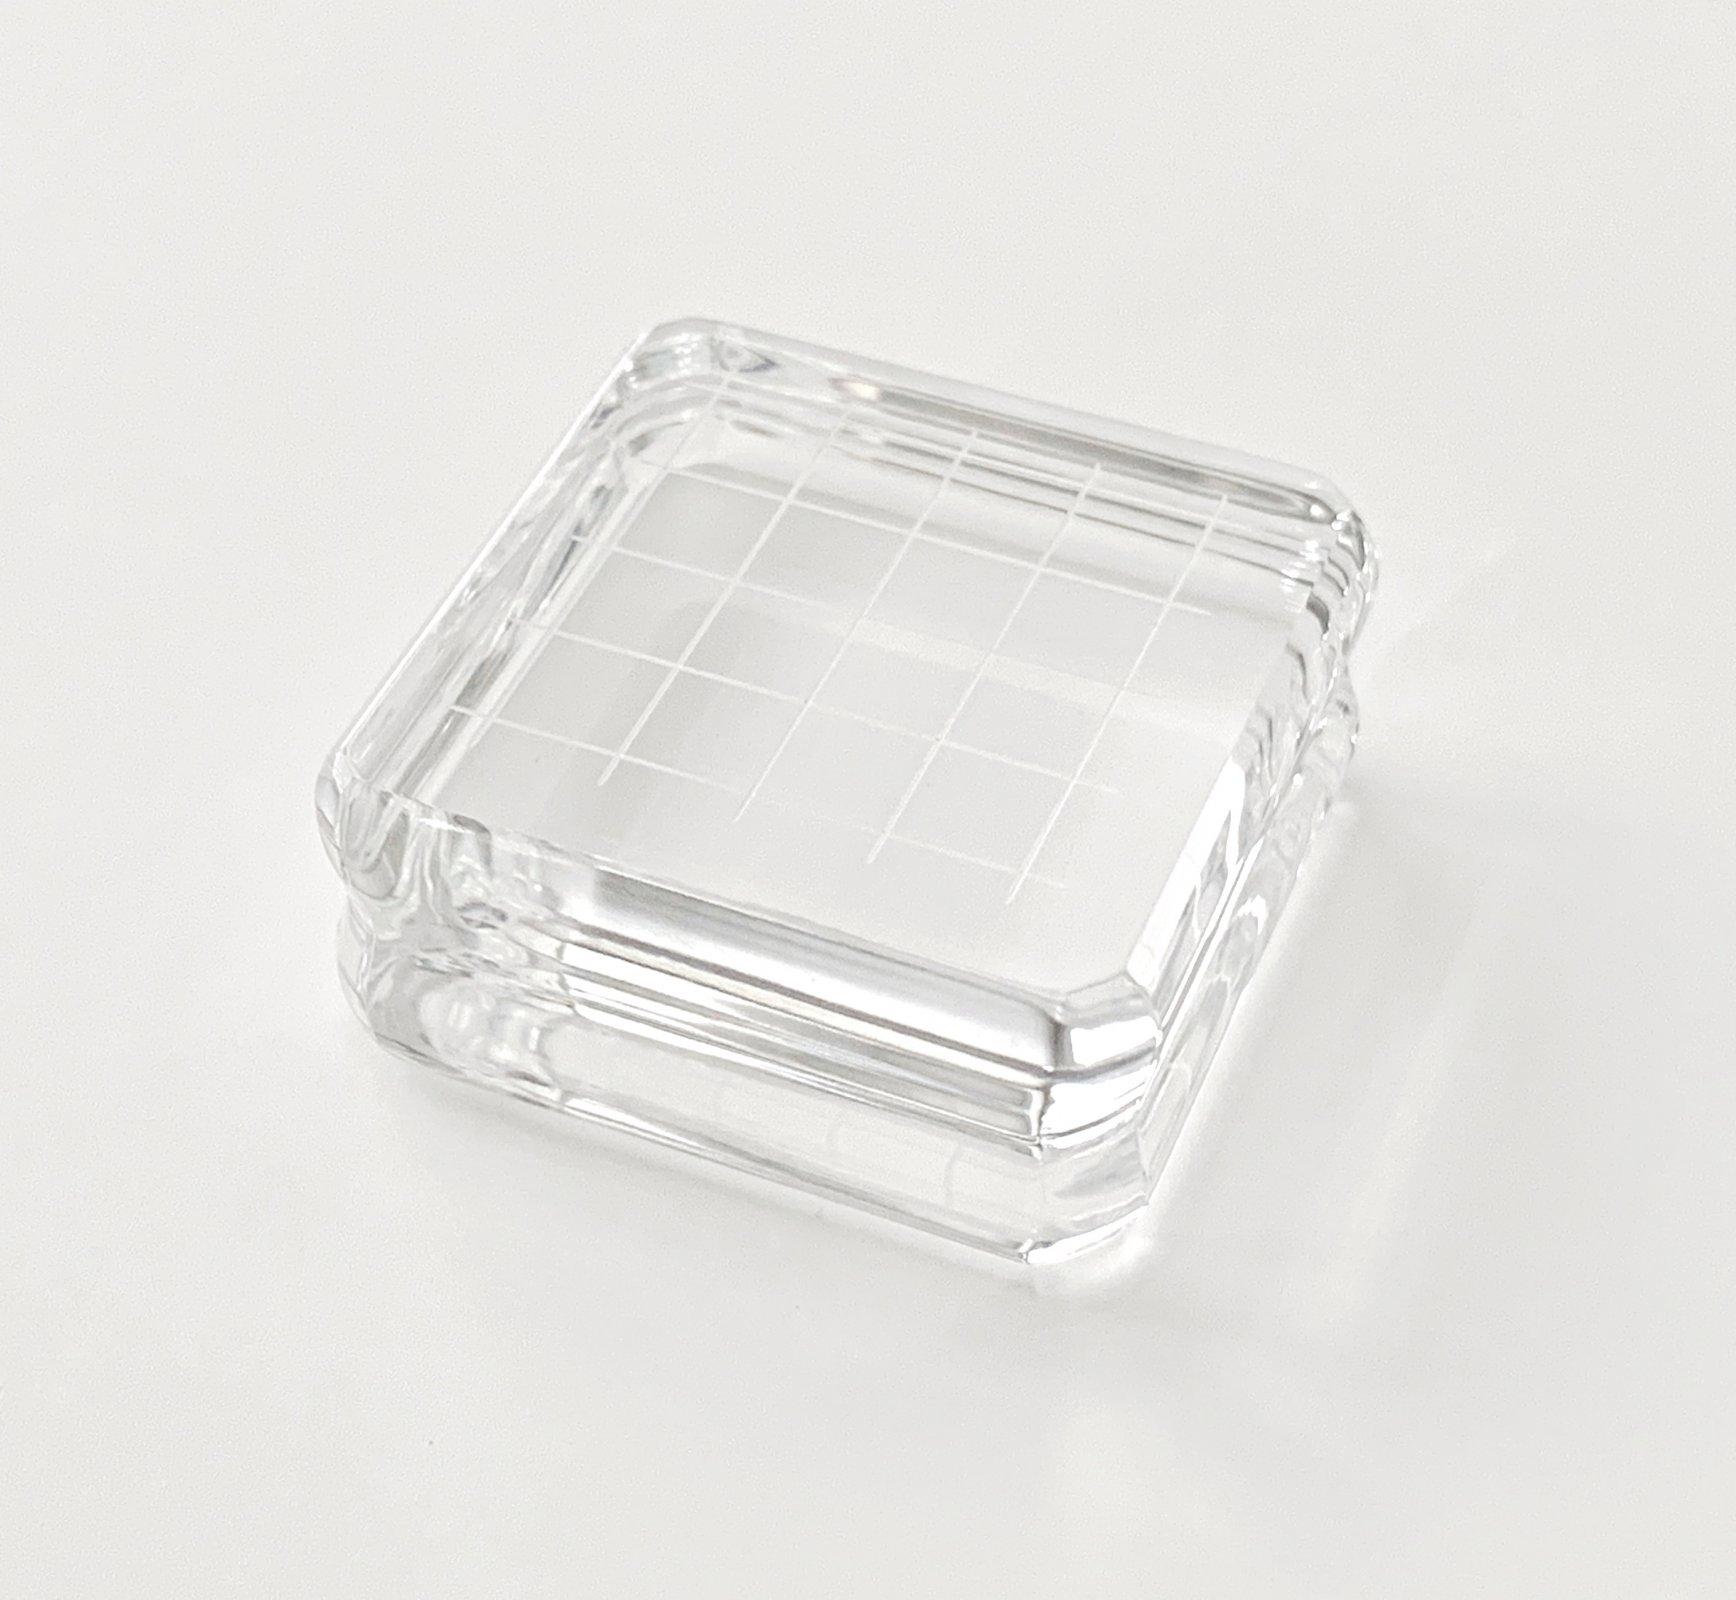 Gina K Comfort Block - Small Square, 1.5 x 1.5